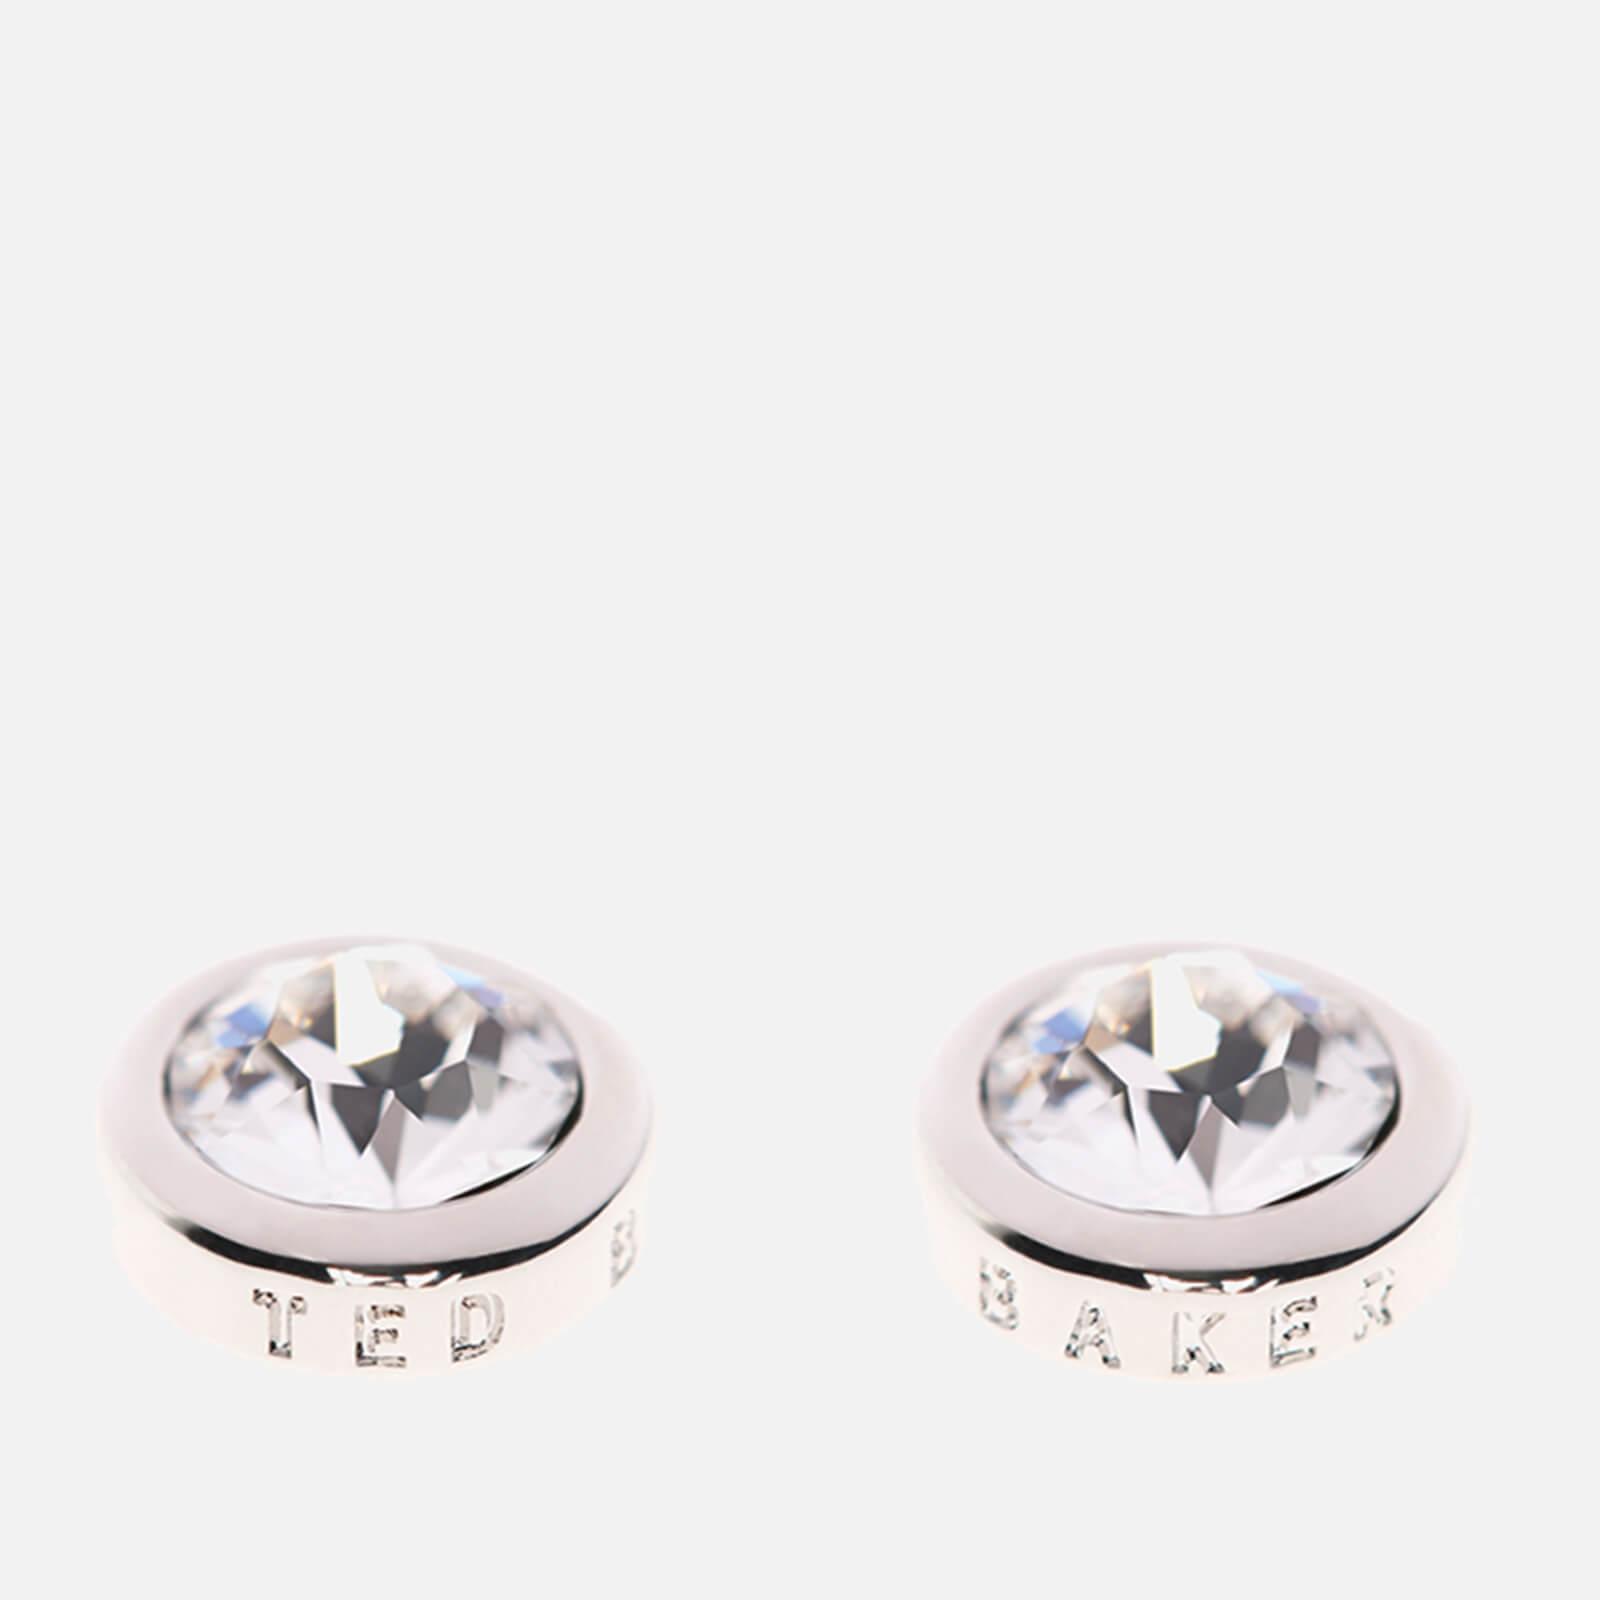 38e91bcf0 Ted Baker Women's Sinaa Swarovski Crystal Stud Earrings - Silver/Crystal - Rose  Gold Womens Accessories | TheHut.com